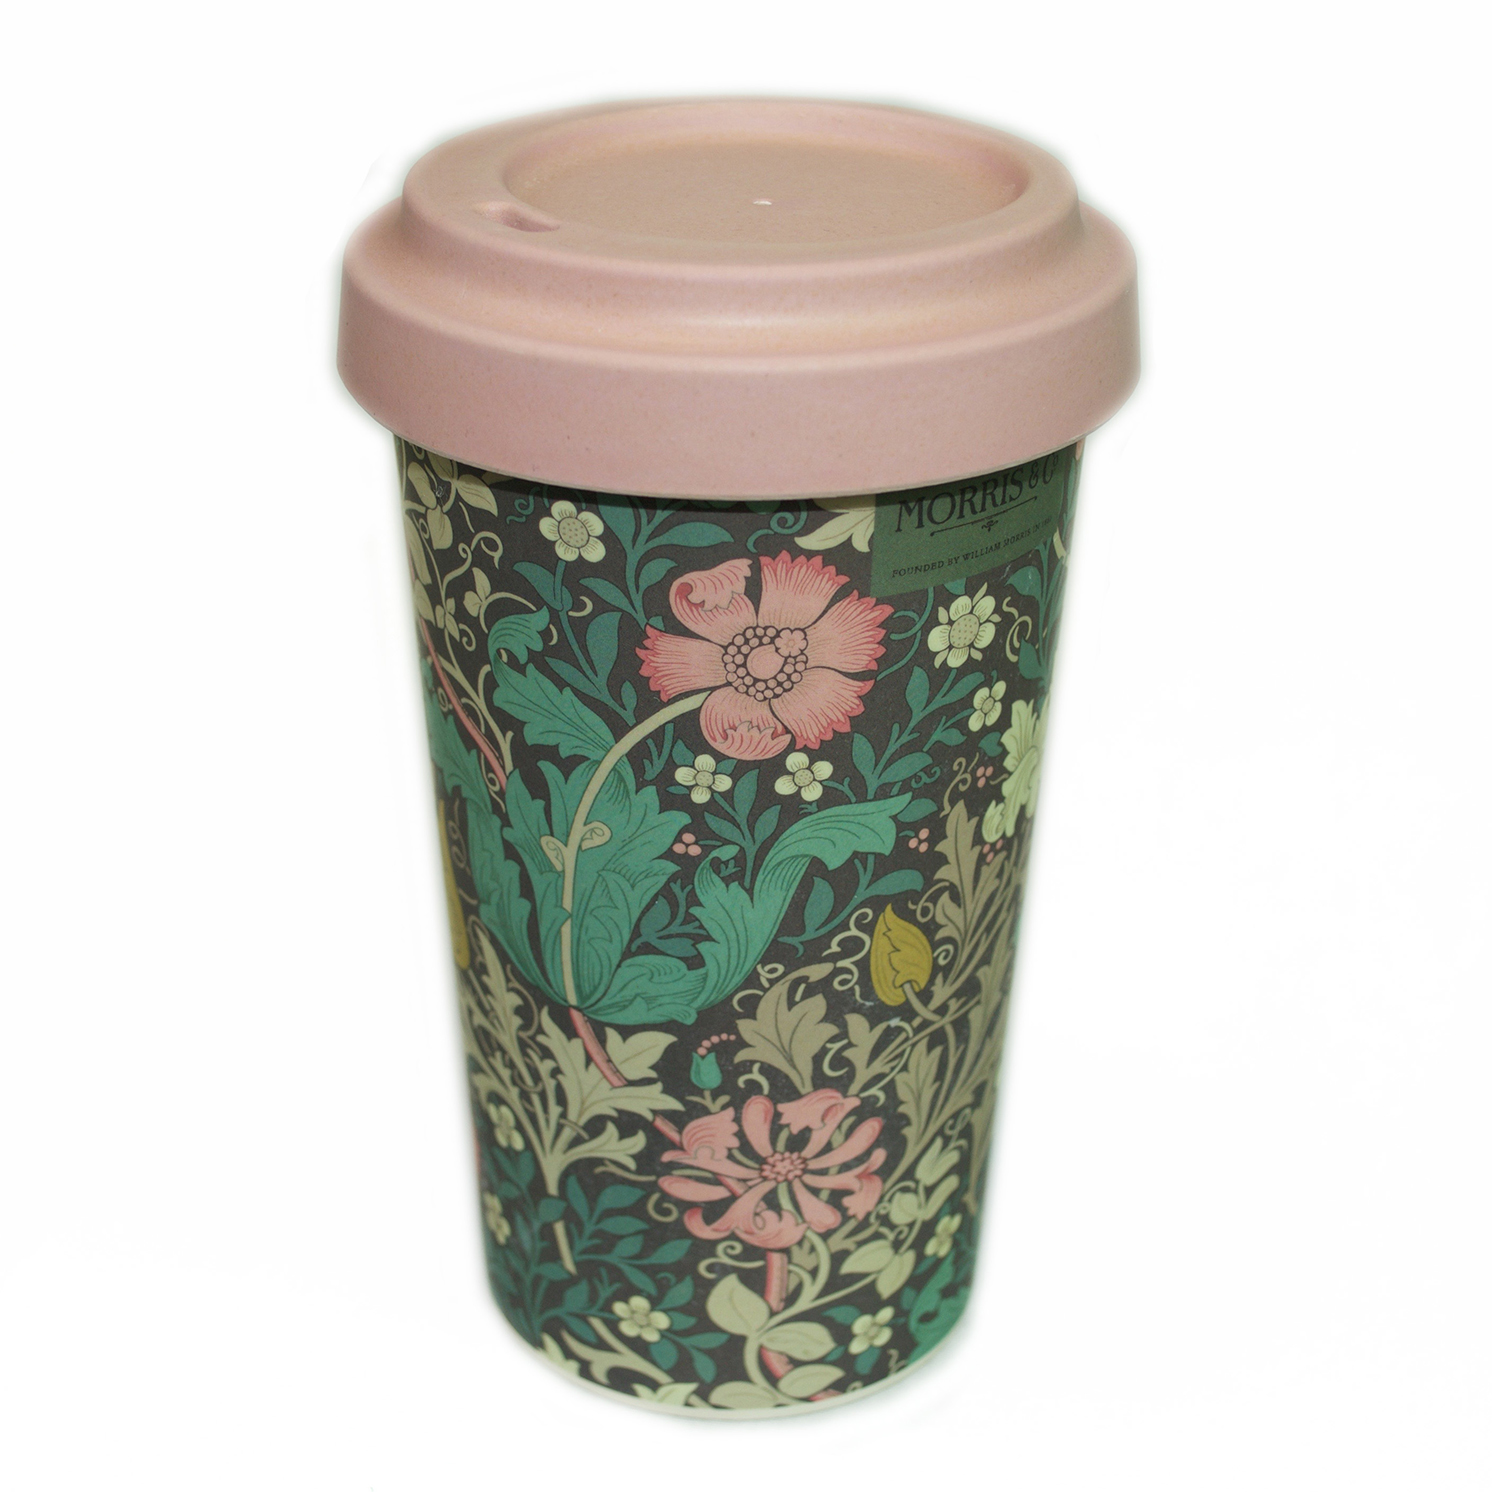 Morris & Co – Compton Print Eco Friendly Bamboo Thermal Travel Tumbler/Mug